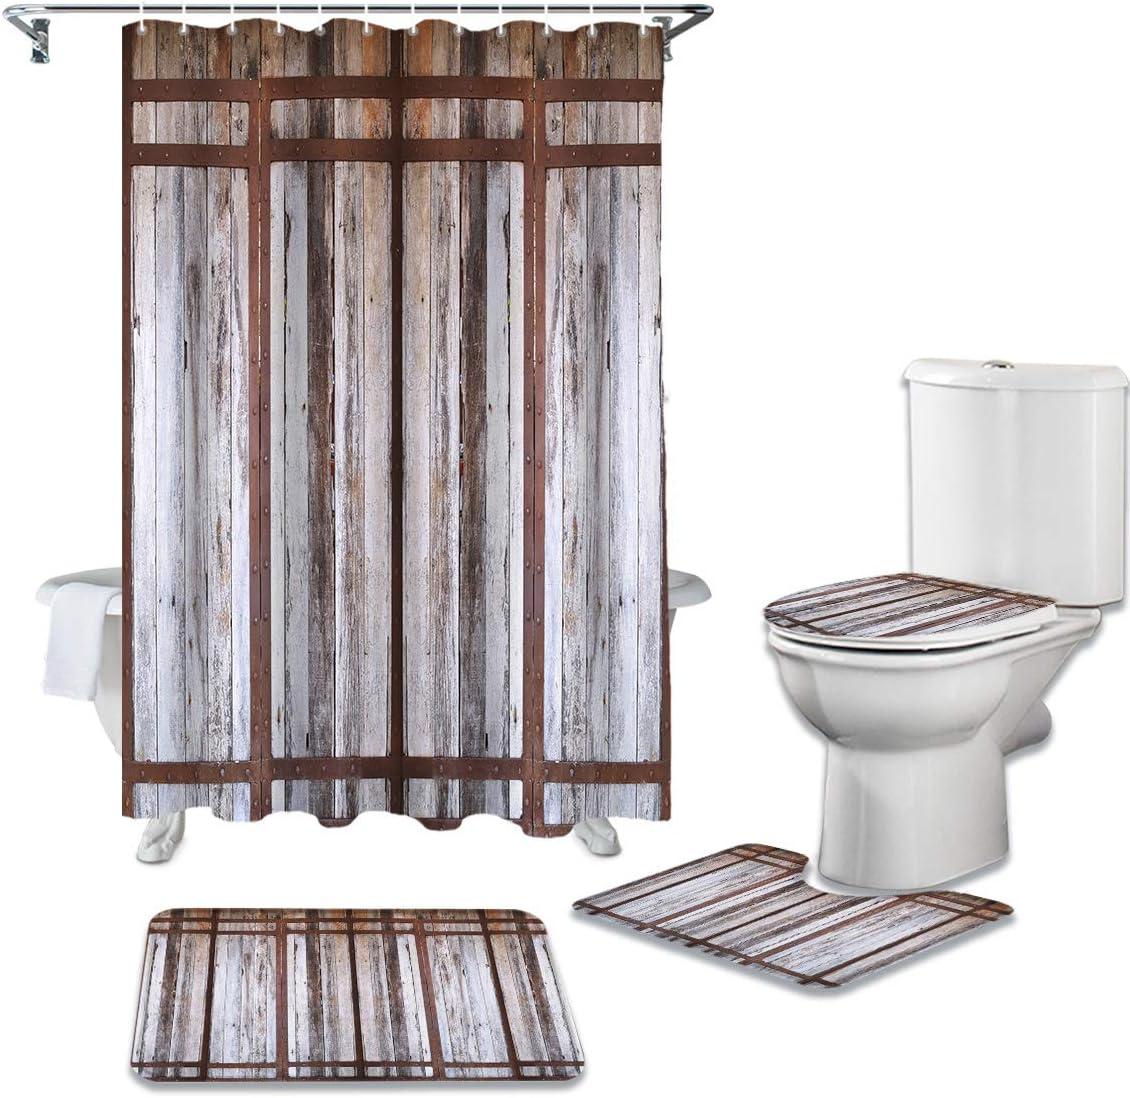 4 Pcs Shower Curtain Soldering Sets with Bathroom Non-Slip Farm Super-cheap Vinta Rugs